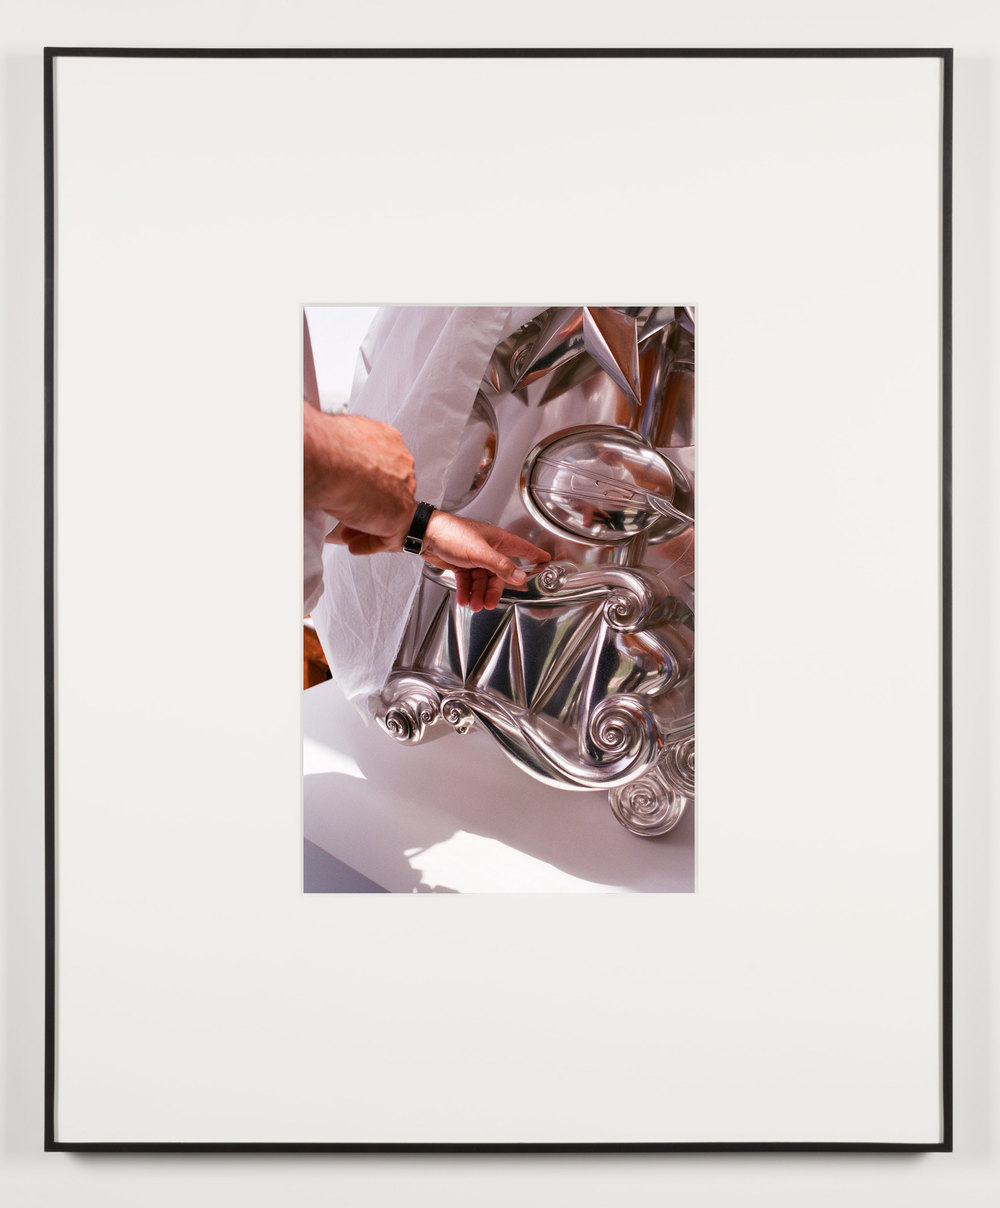 Alphabet der Leidenschaft (Beirut, Lebanon, June 1, 2013)    2014   Chromogenic print  20 x 13 1/2 inches   Selected Bodies of Work, 2014